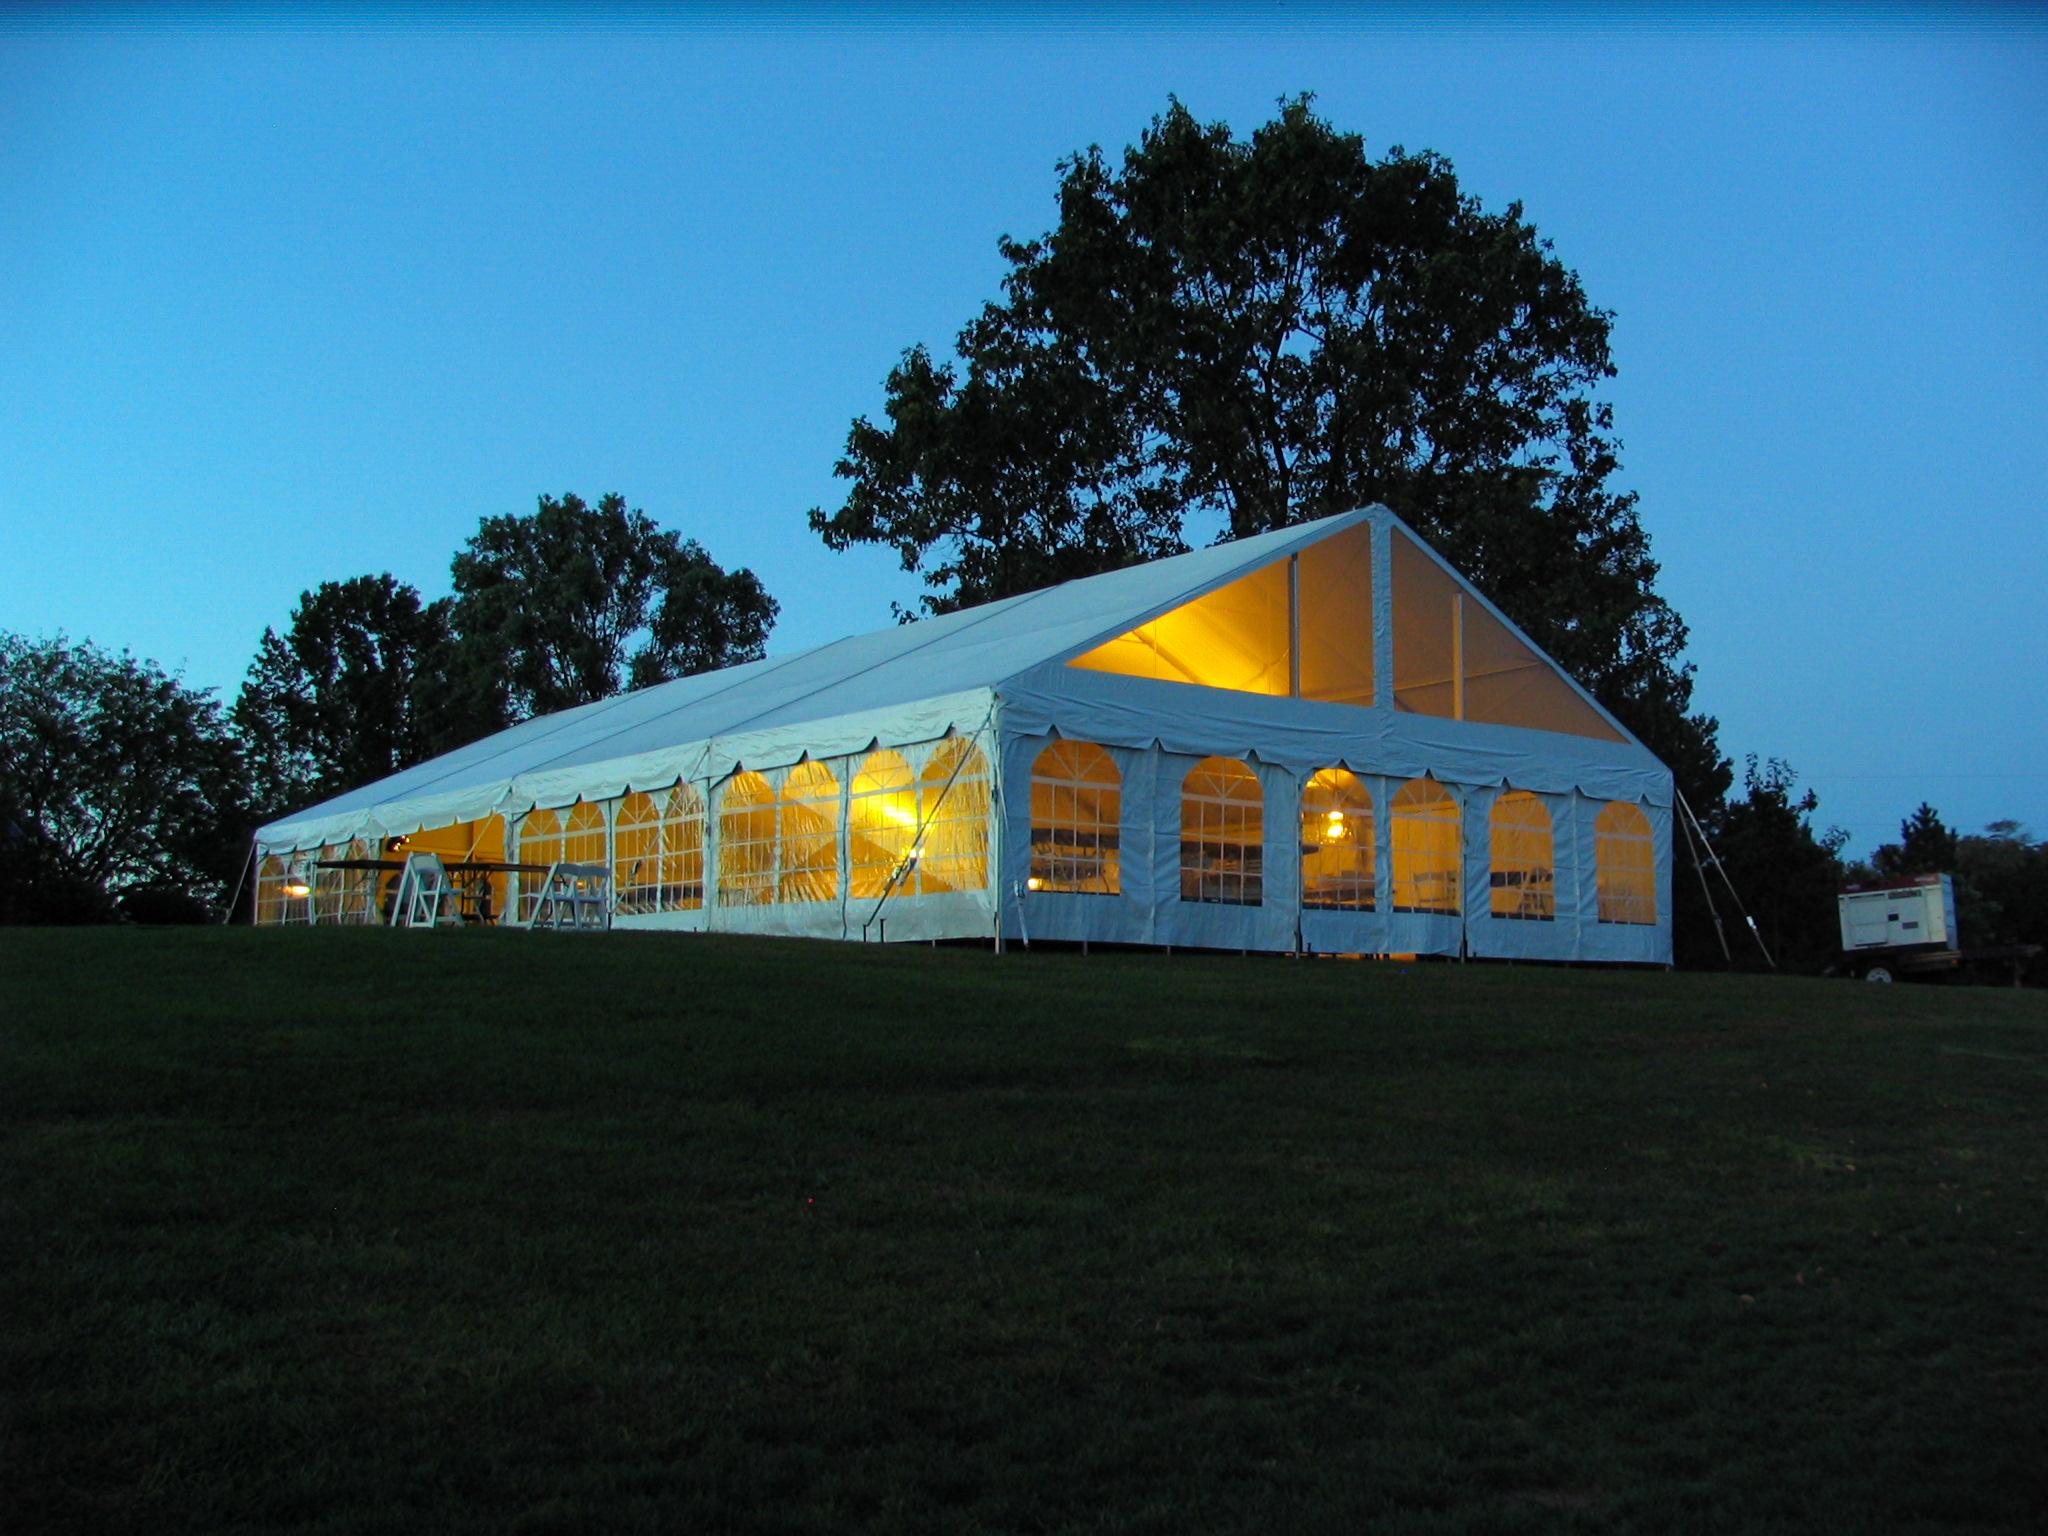 Frame tent rentals in Pennsylvania